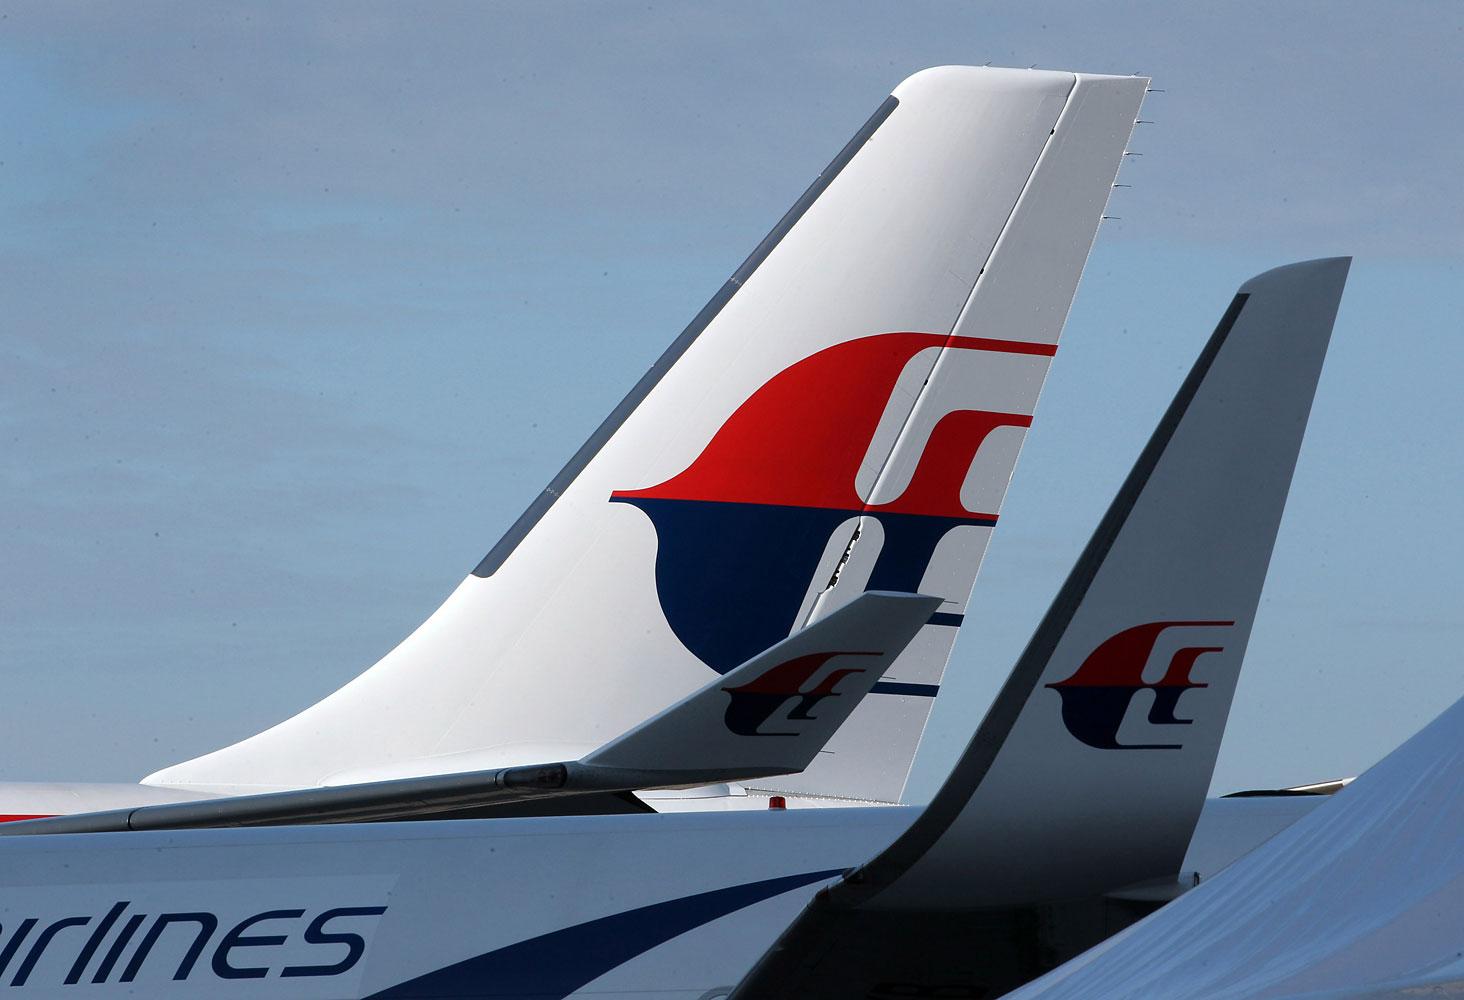 A Malaysia Airlines aircraft at the Kuala Lumpur International Airport, Jan. 2013.